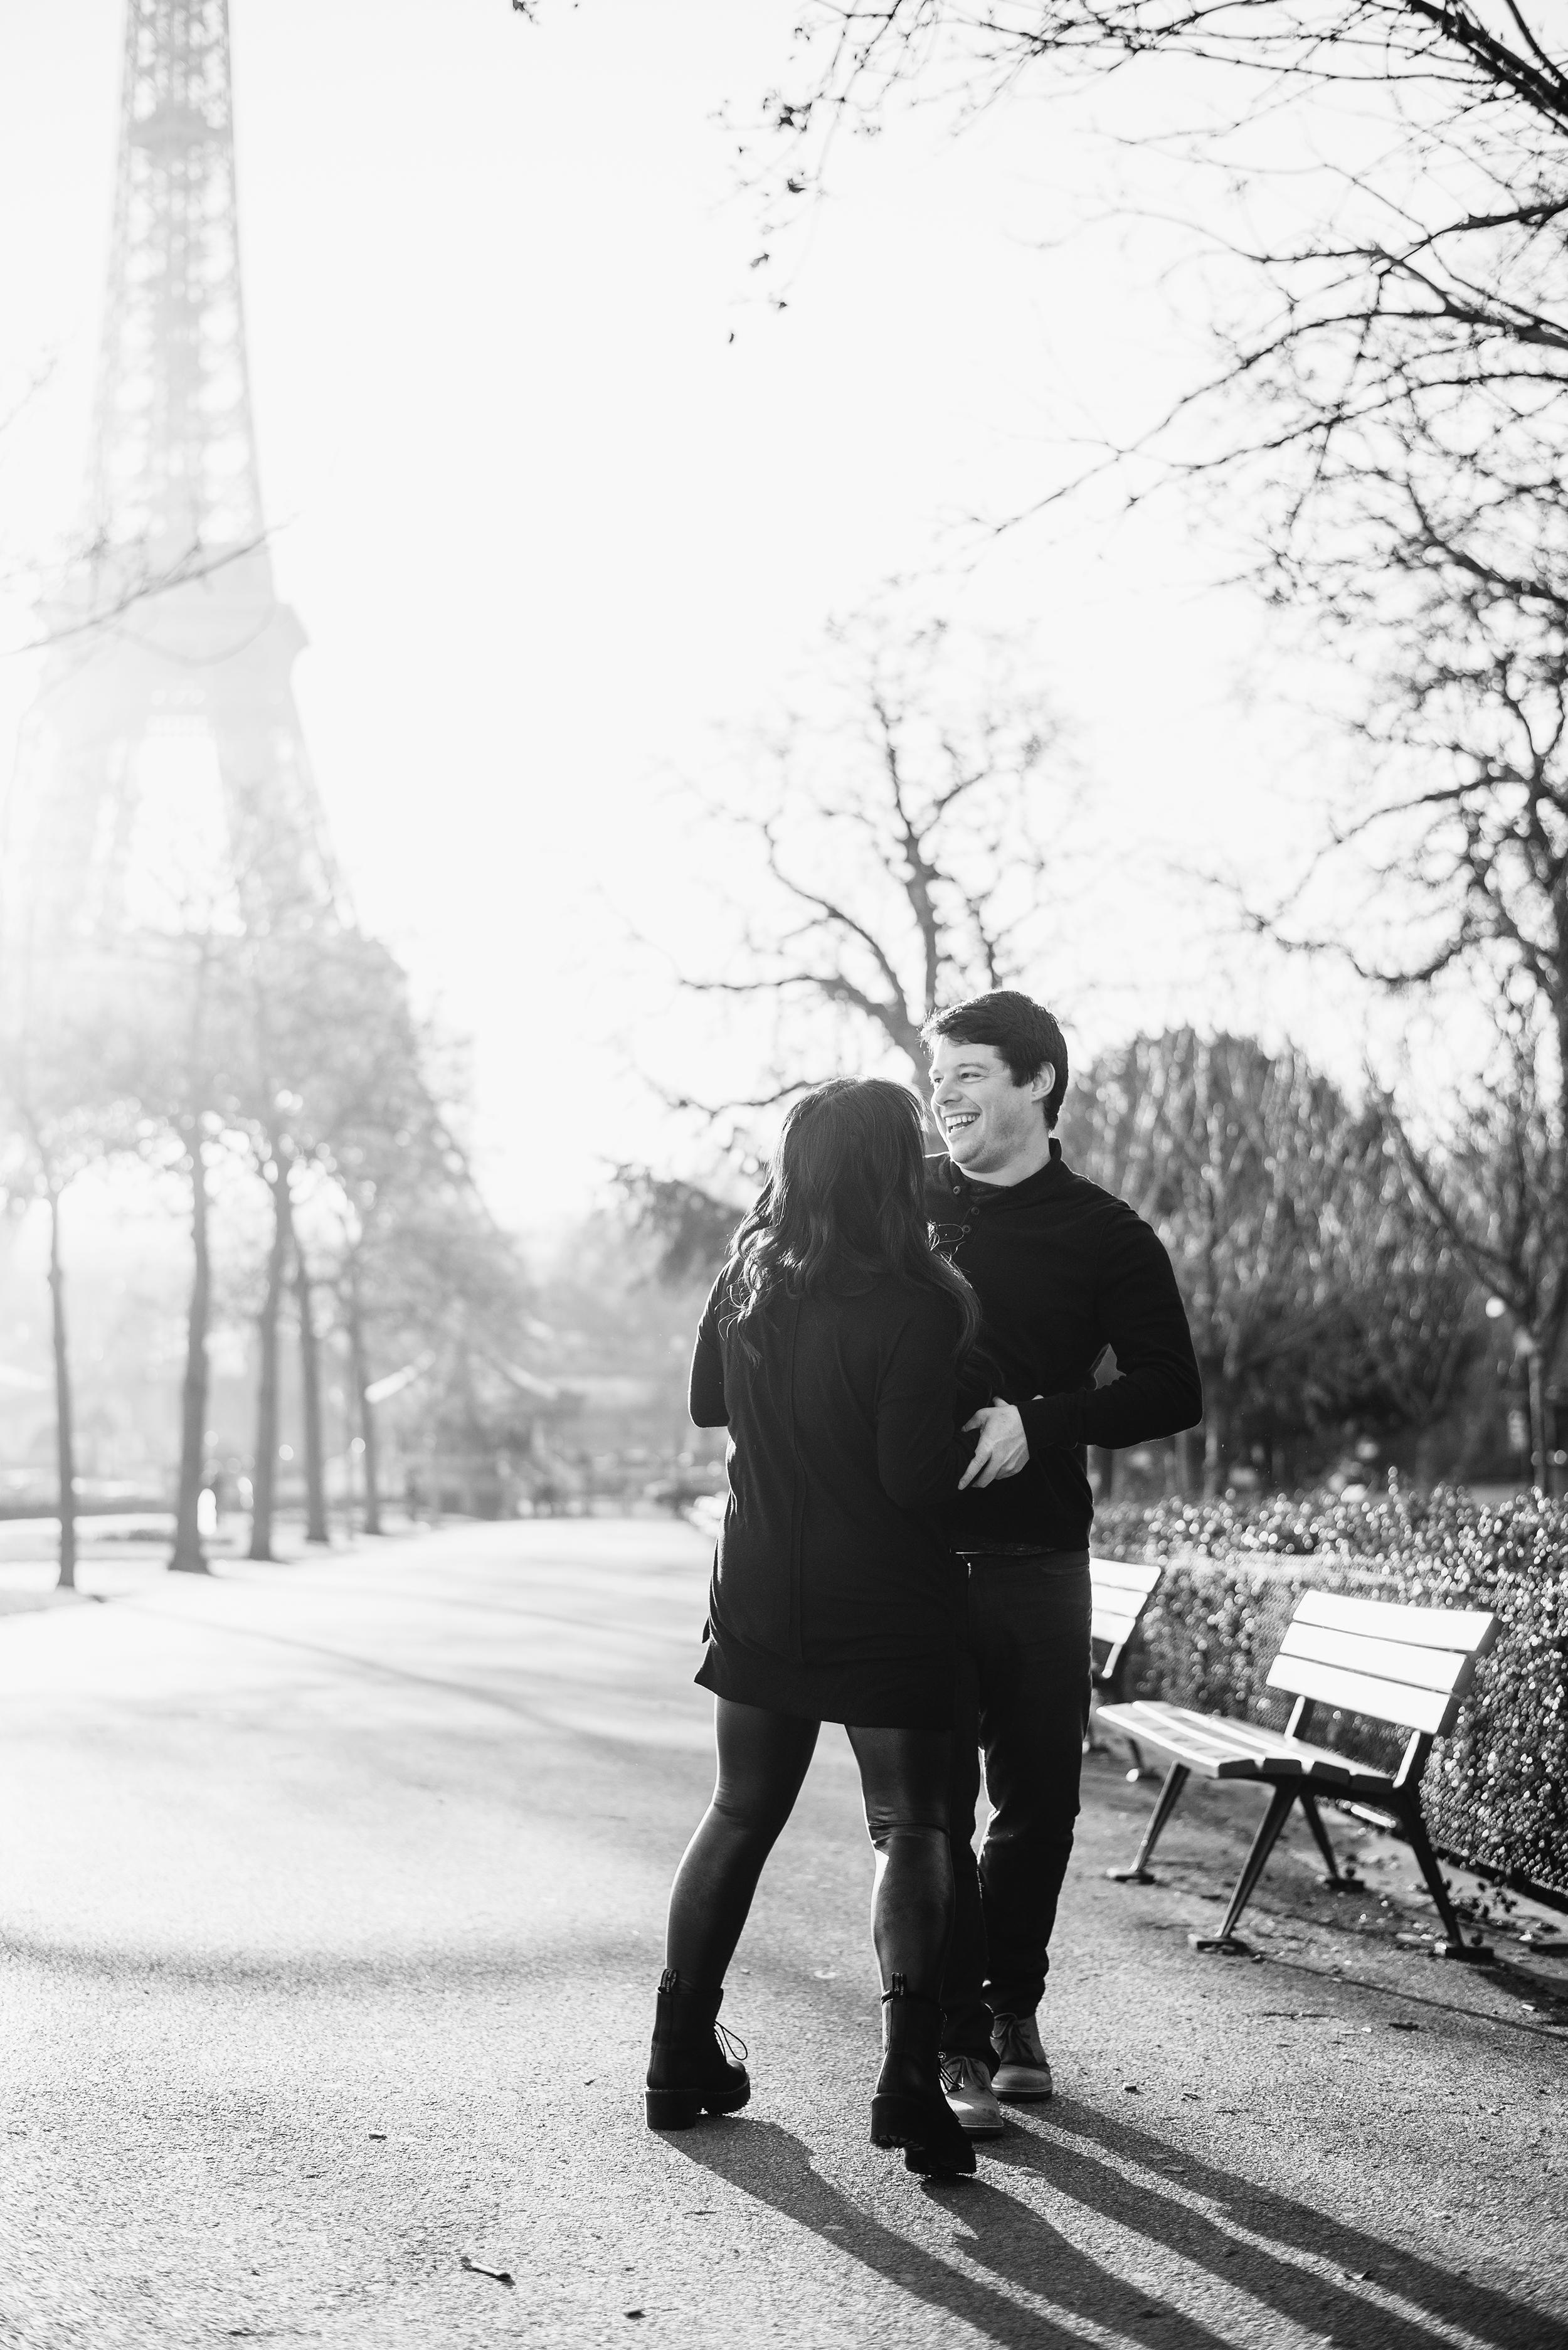 Anniversary-photoshoot-Paris-Trocadero-EiffelTower-Cafe-028.jpg